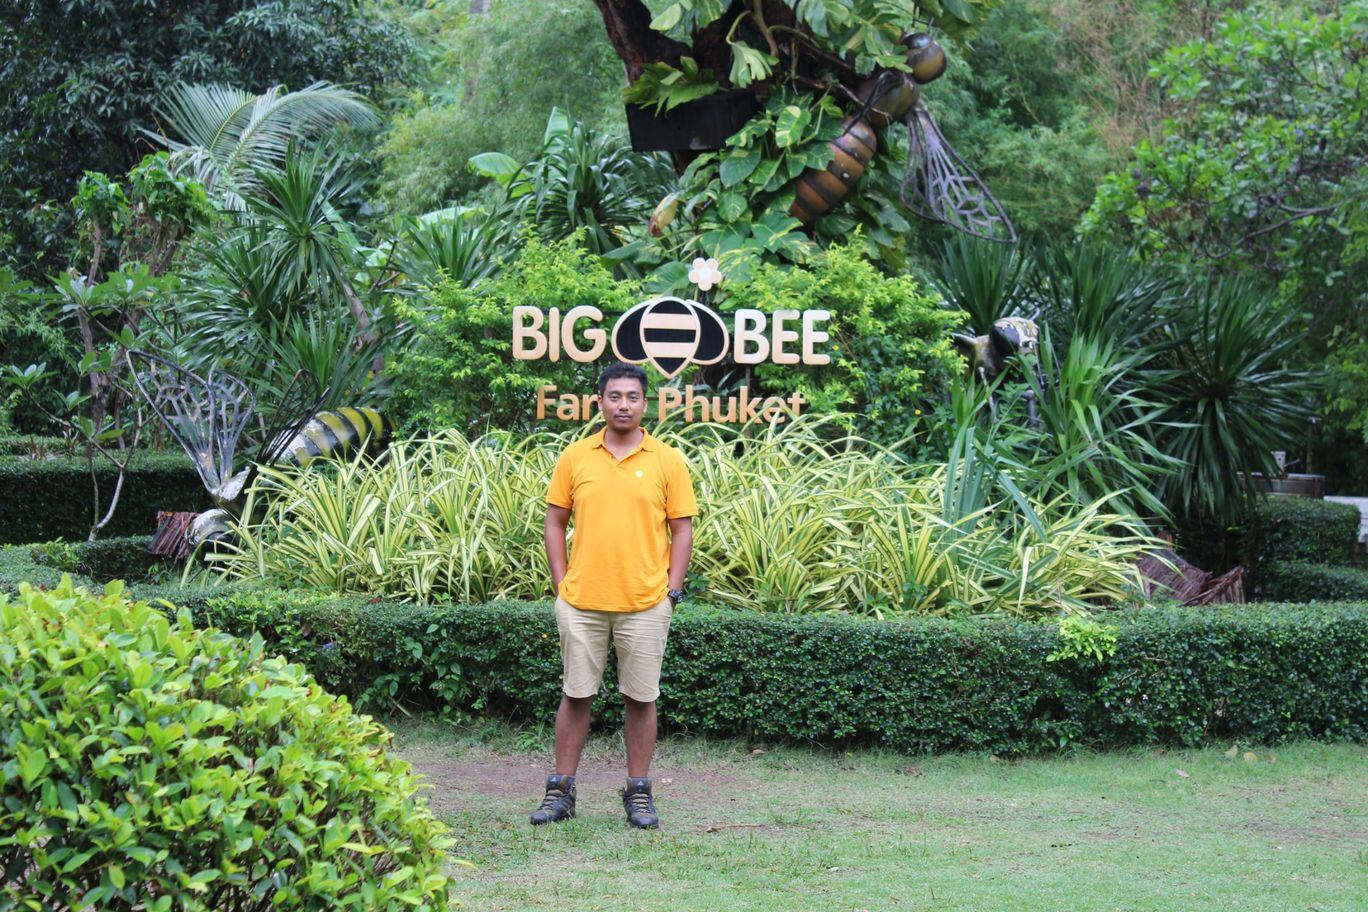 Photo of Big Bee; phuket By NIRUPAM BORGOHAIN